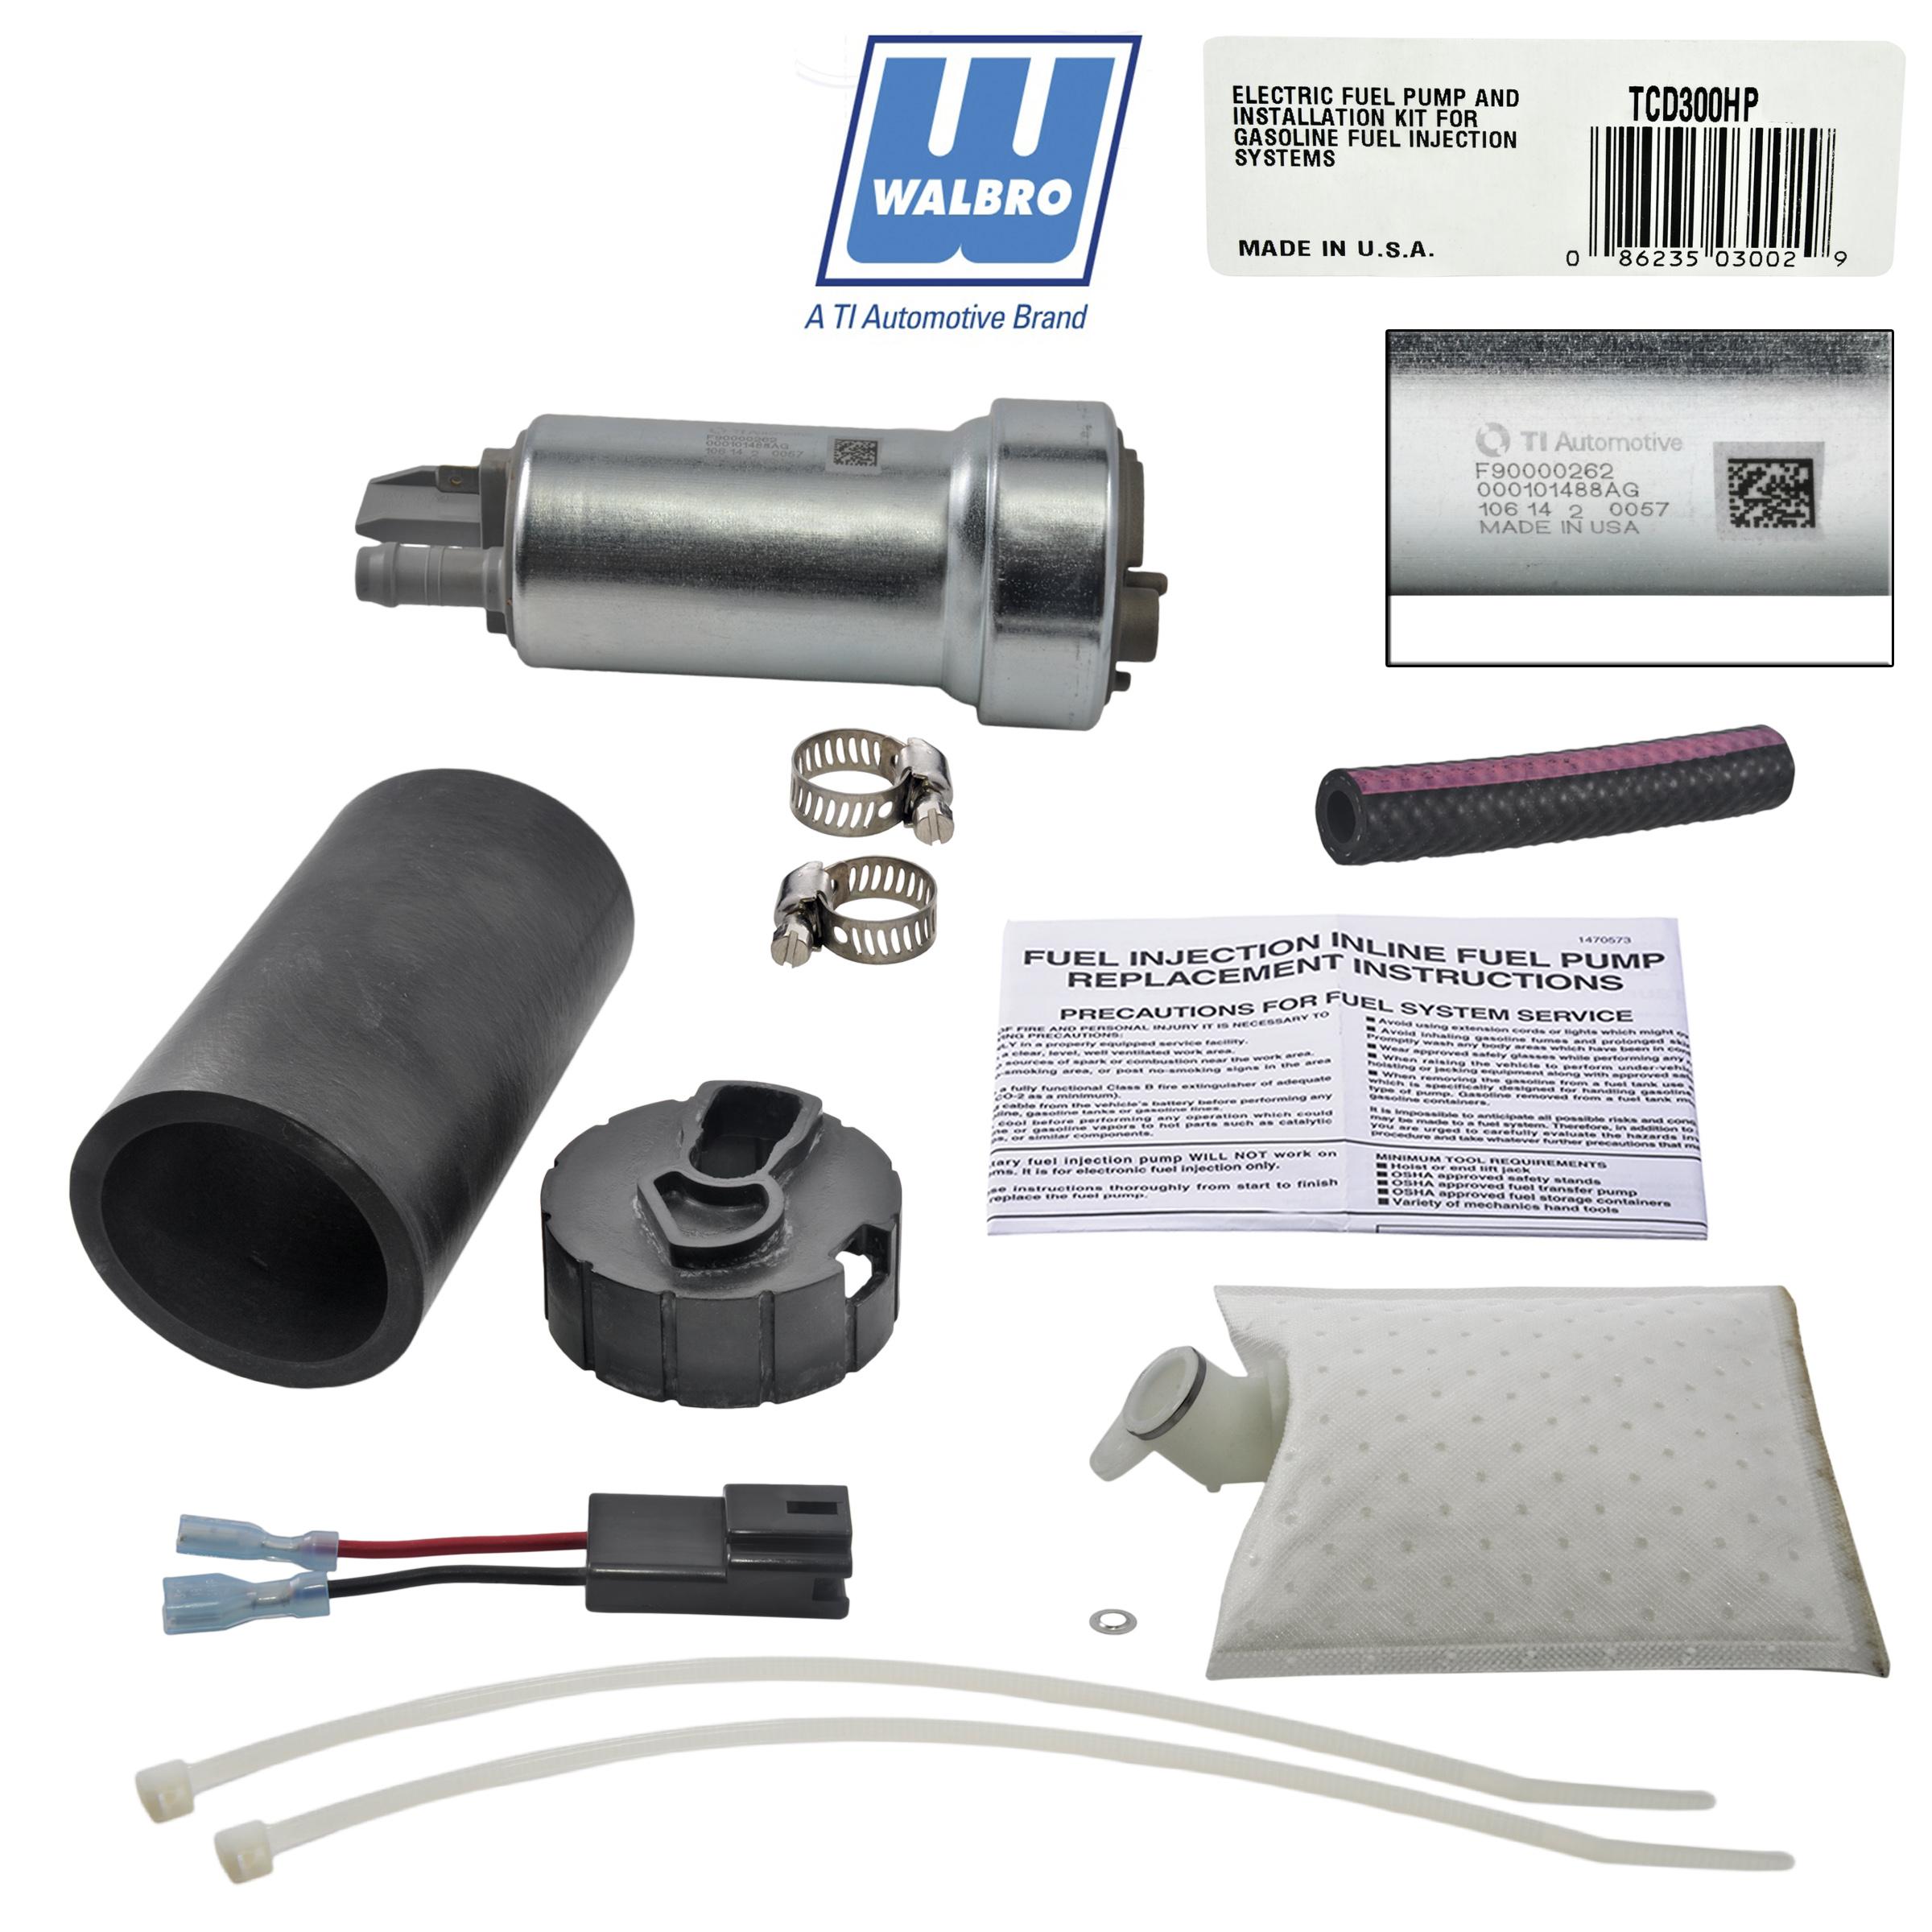 New Walbro 400lph 500hp High Pressure Racing Intank E85 Fuel Pump Electric Installation Instructions Description